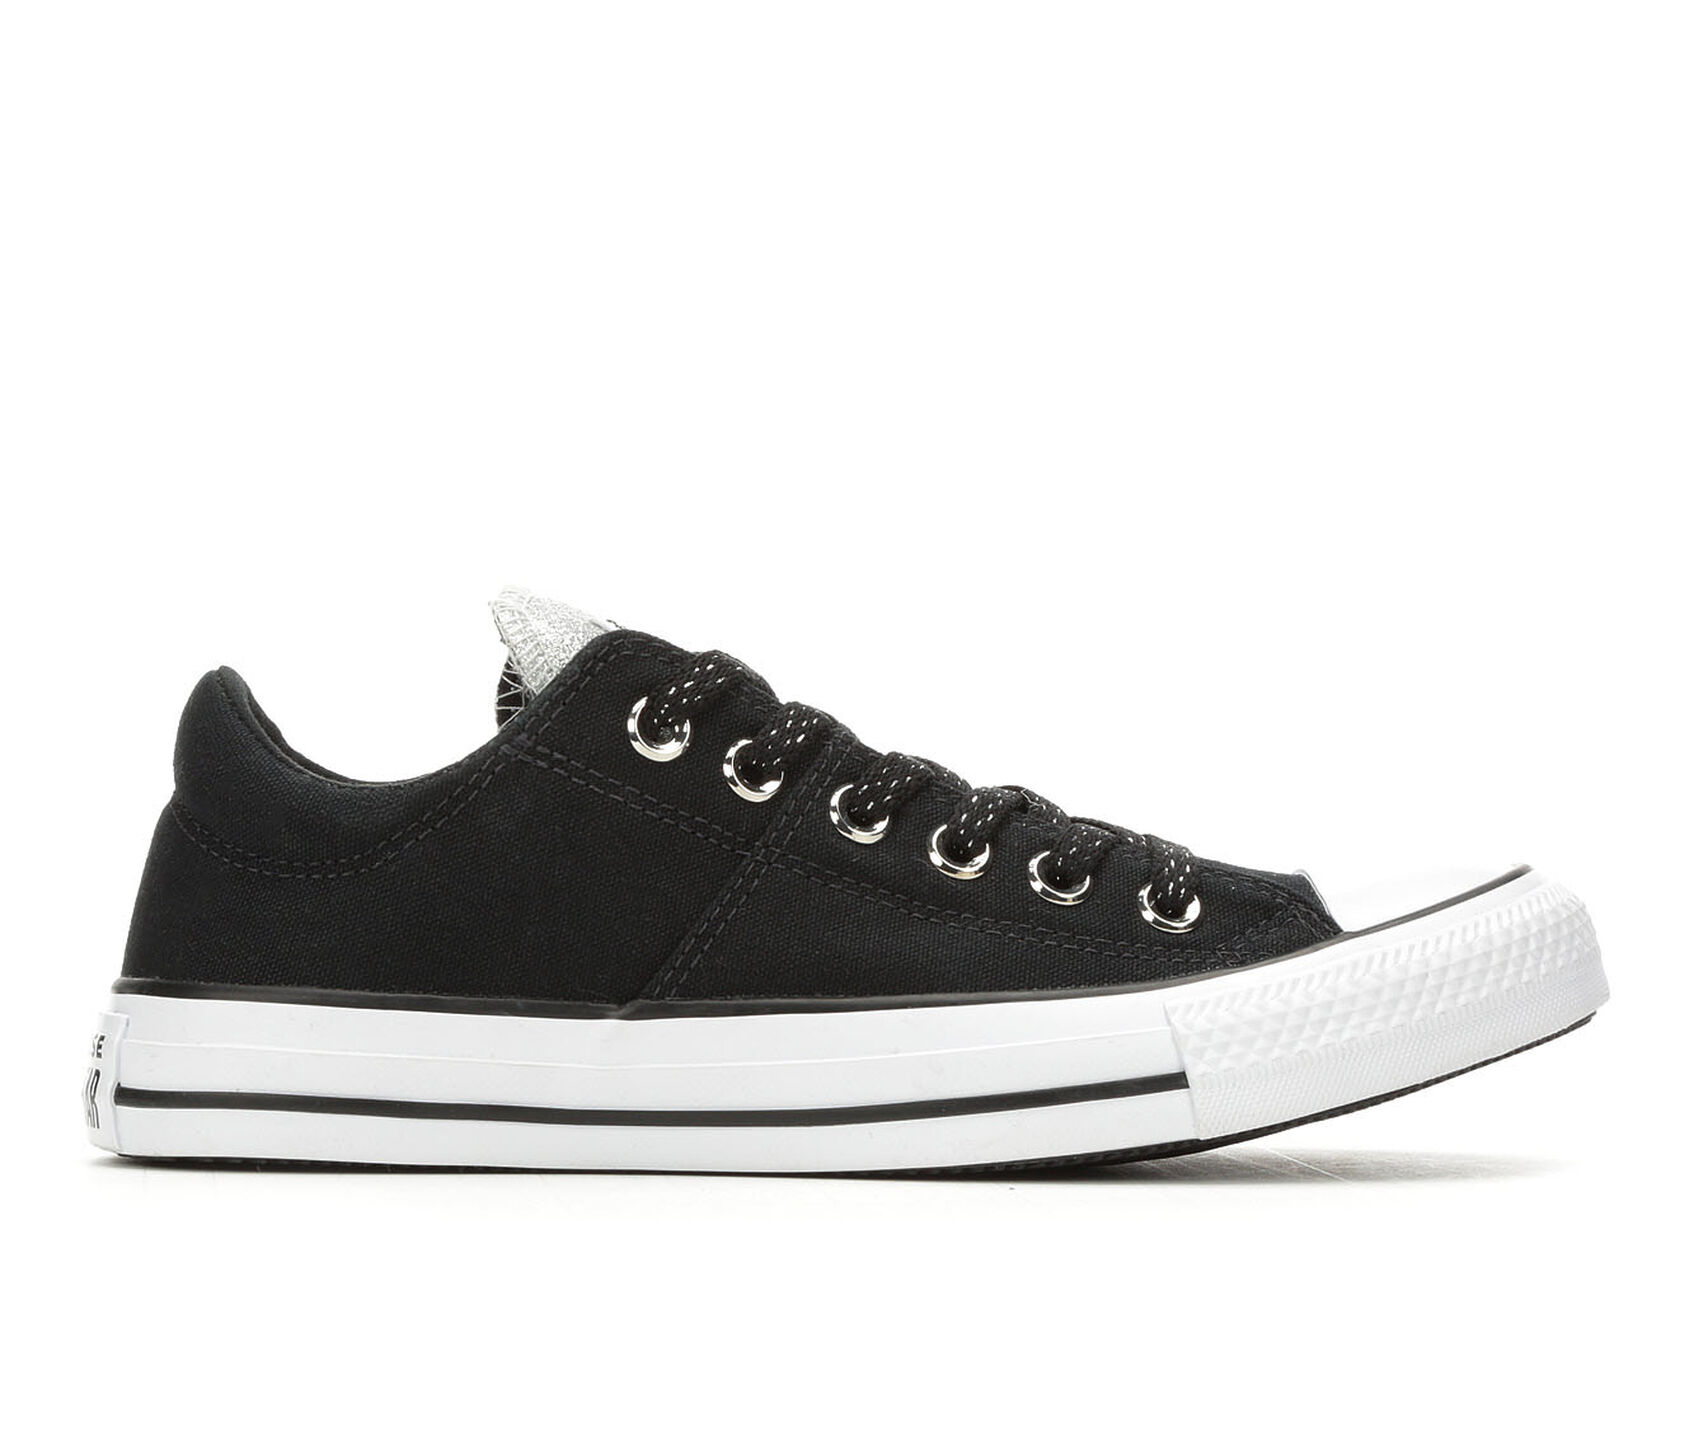 d483148086a1c Women's Converse Madison Glitter Sneakers